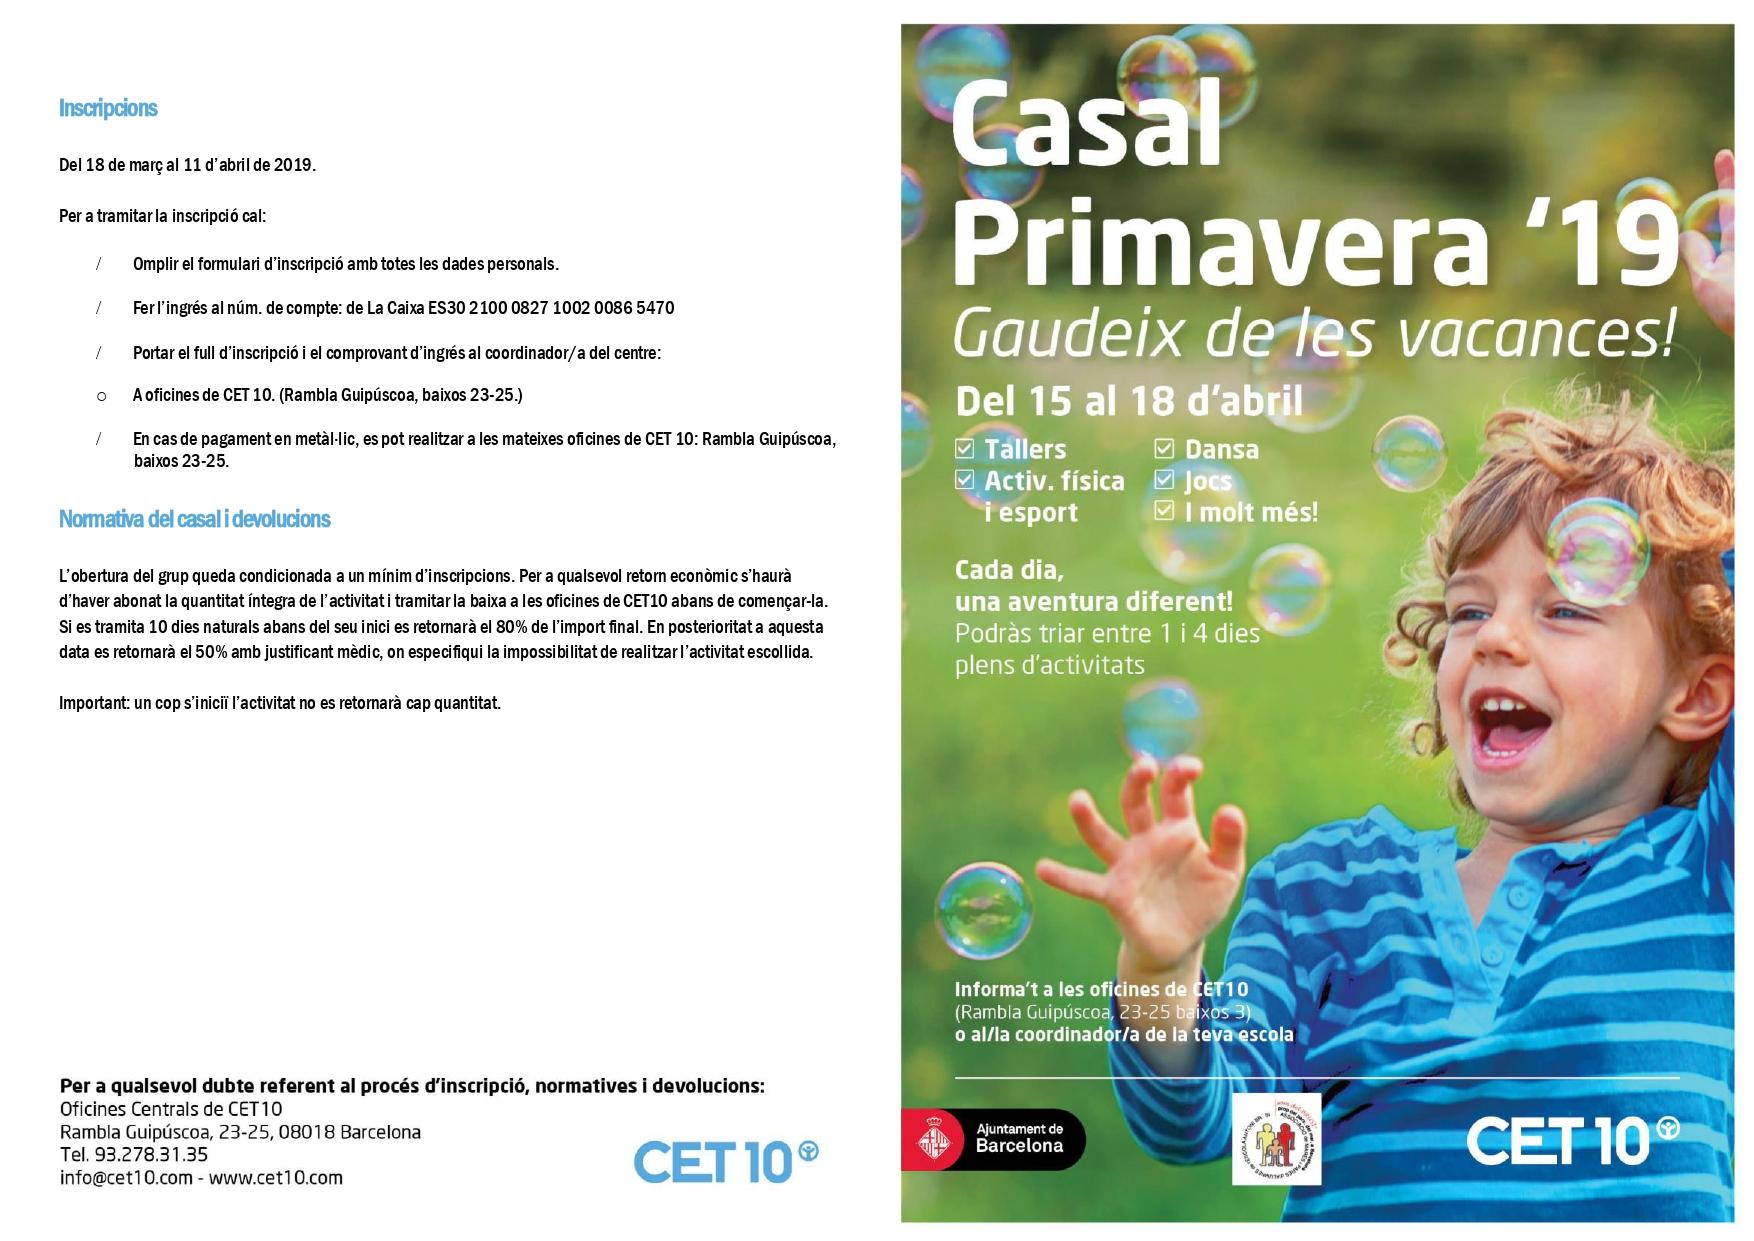 DIPTIC CASAL Primavera 19 - Antoni Brusi (2)_page-0001